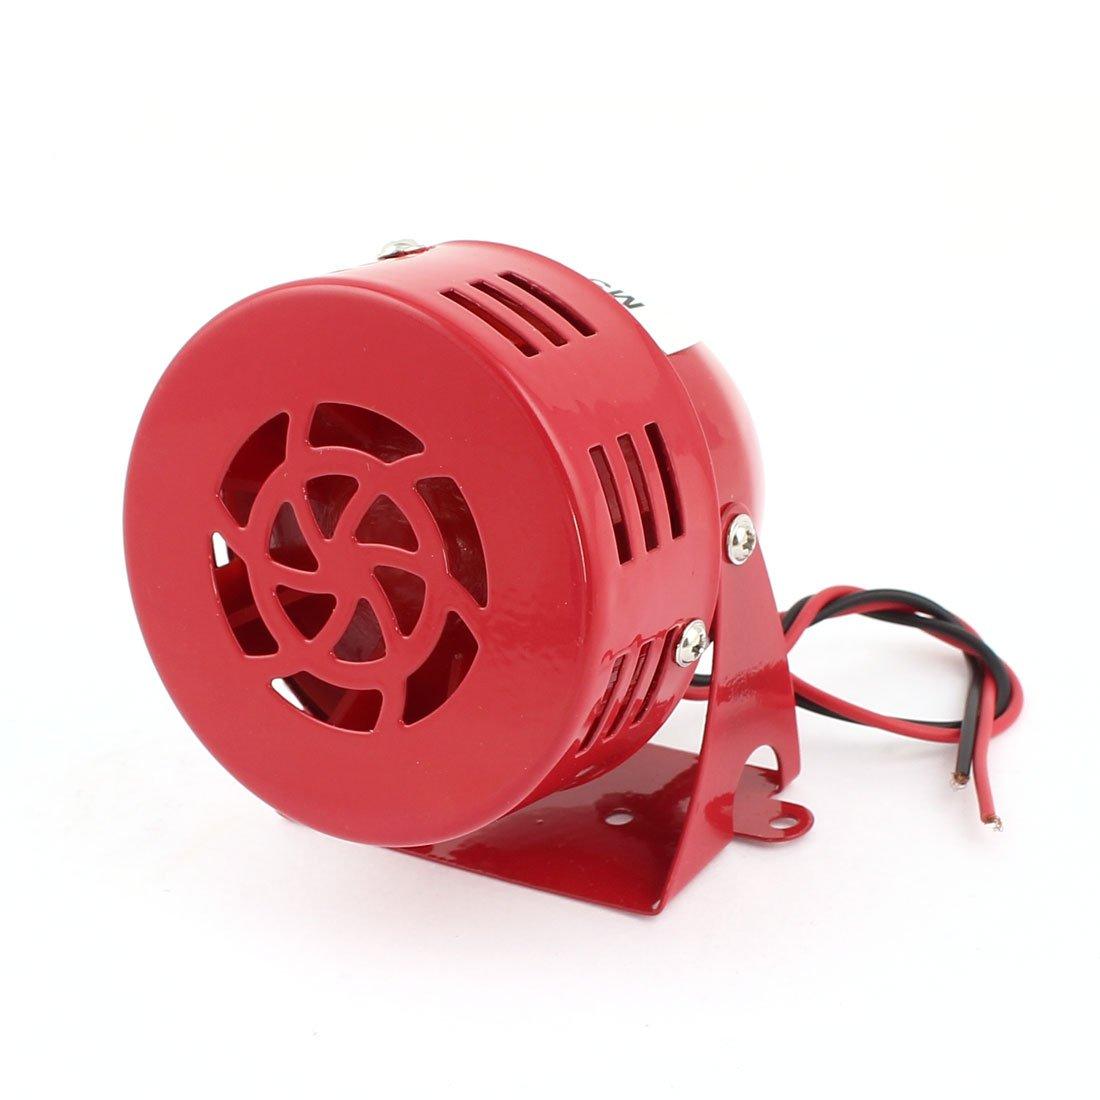 School Factory Alarm Alarmanlage Electric Red DC 24V - 190 MS